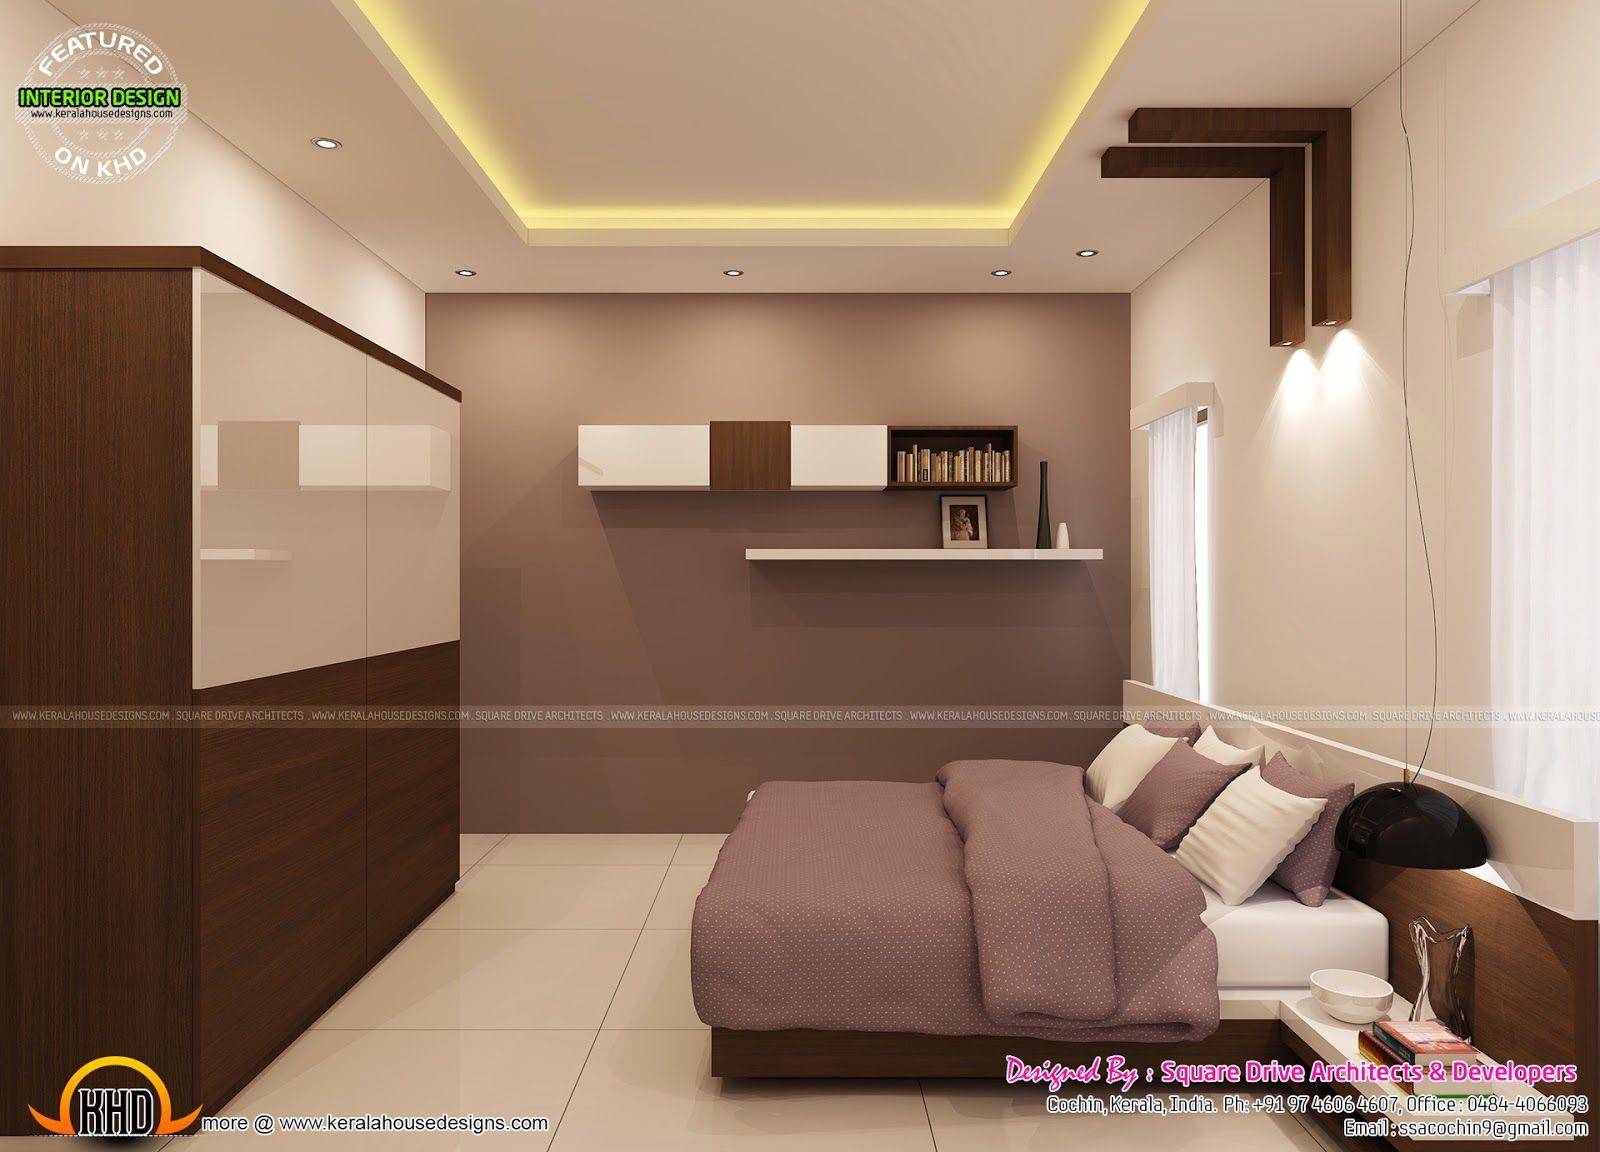 Bedroom Interior Decoration Kerala Home Best Home Interior Design Interior Design Bathroom Interior Design